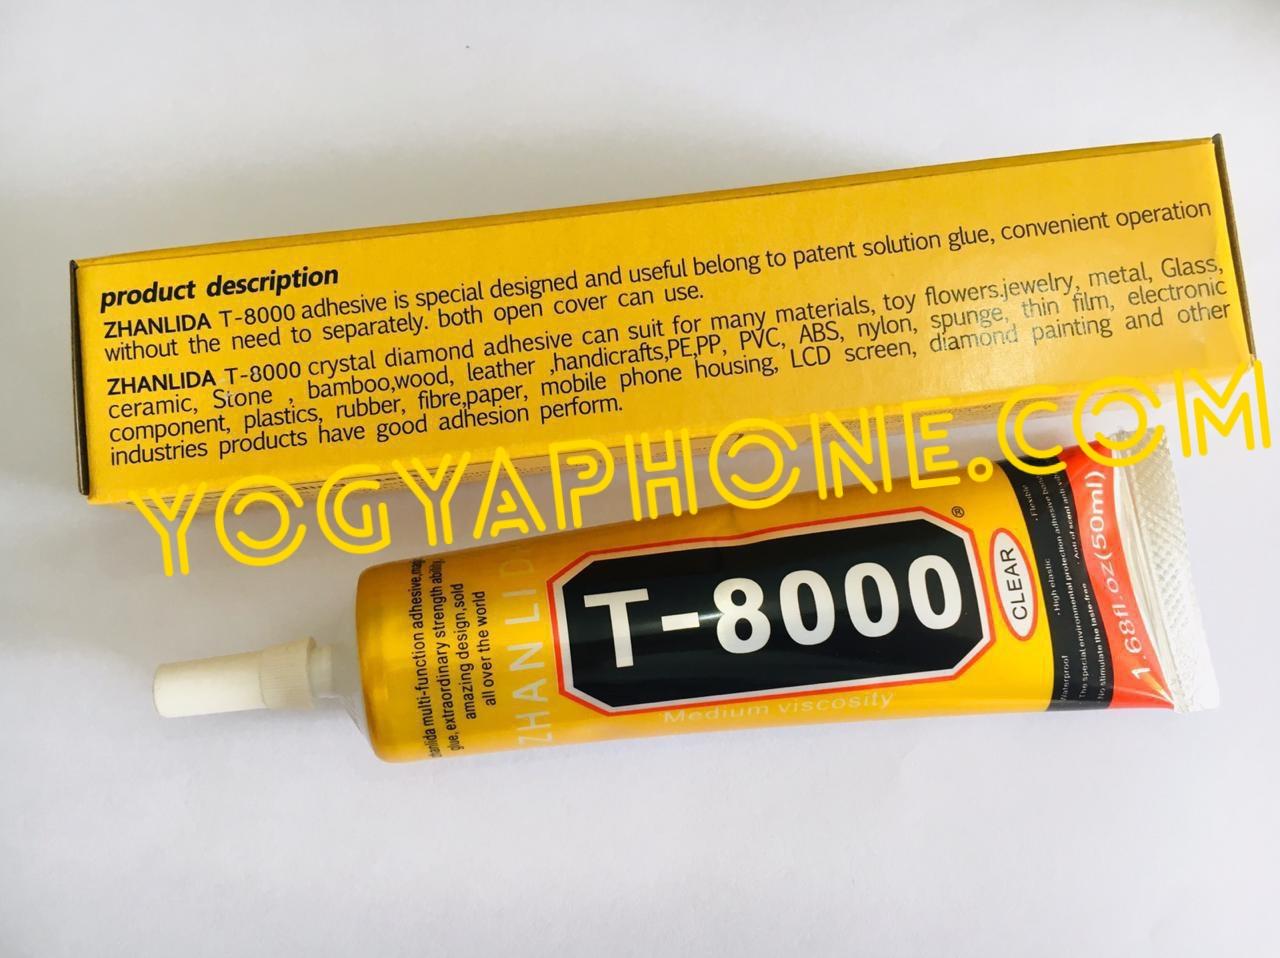 Glue+Zhanlinda+T+8000+b.jpg (1280×958)